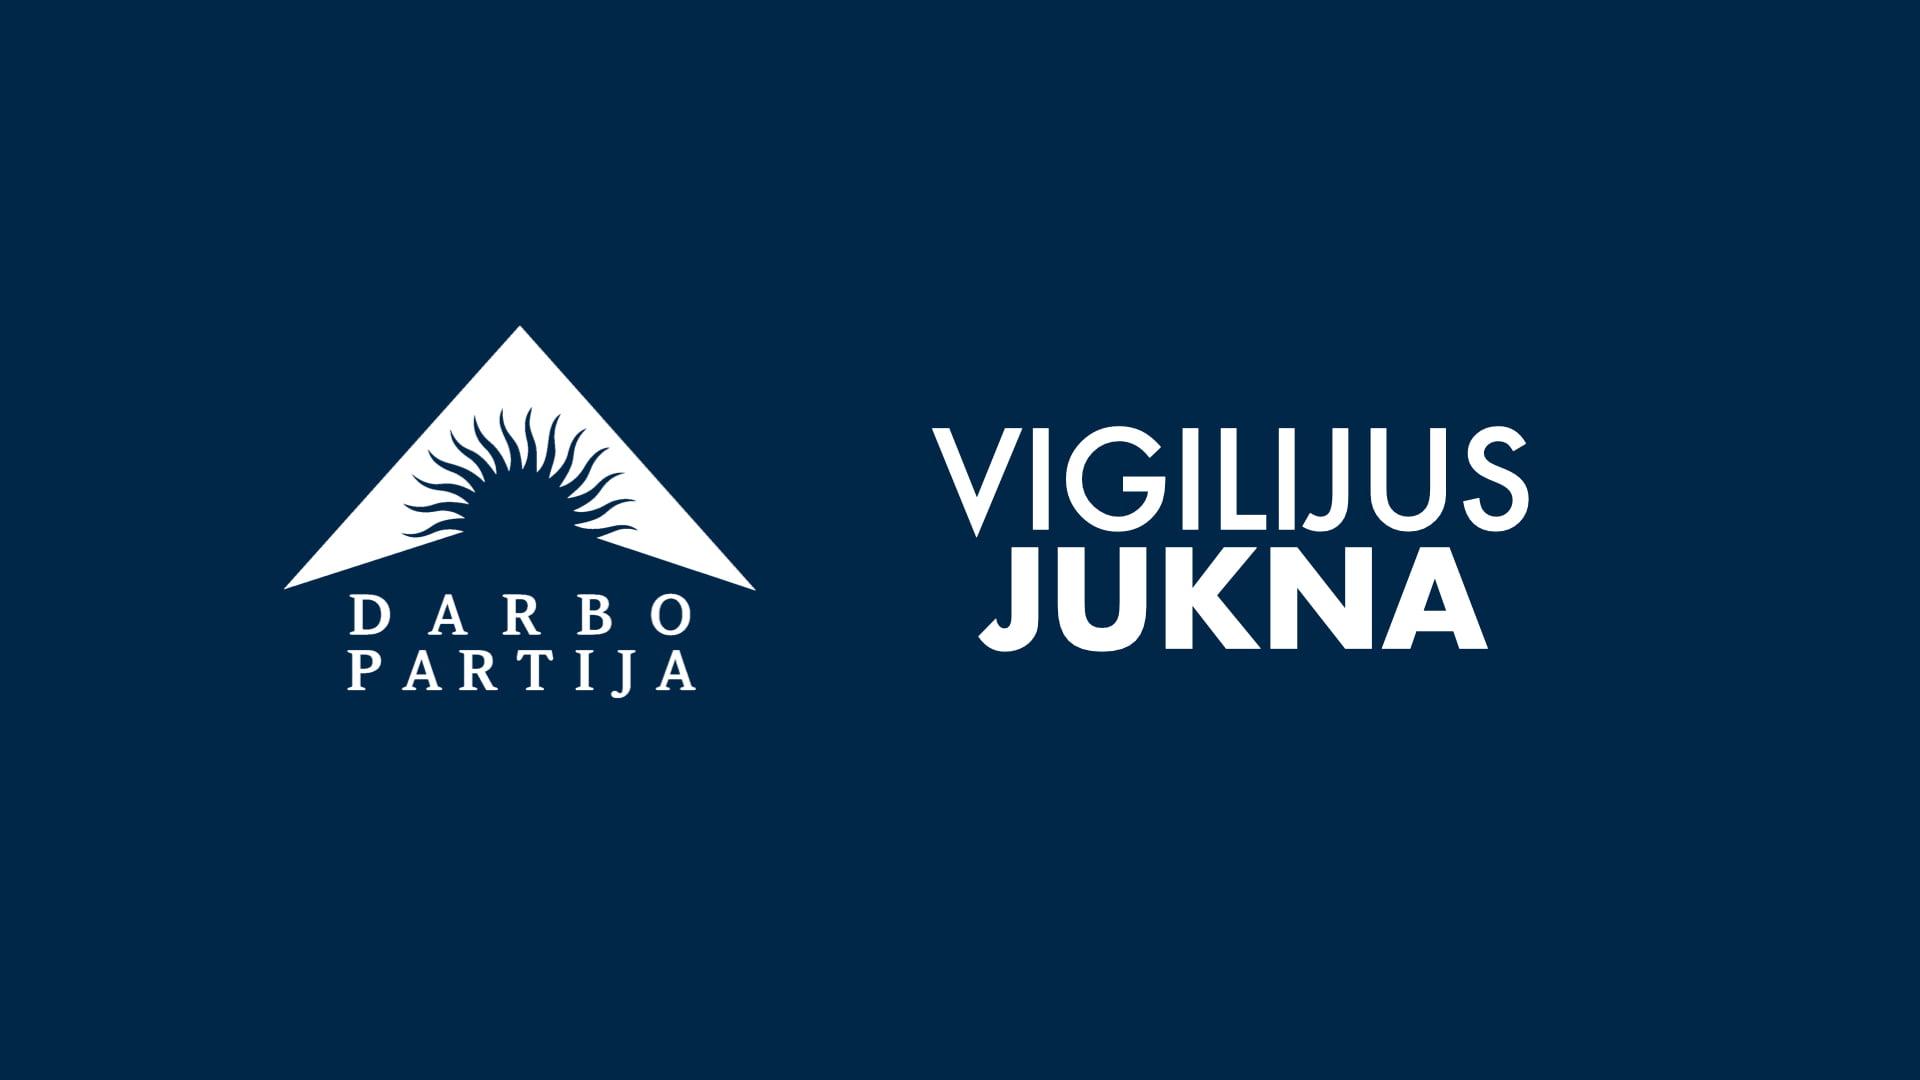 http://www.jukna.lt/wp-content/uploads/2020/06/Vigilijus-Jukna-logo-footer.001.jpg